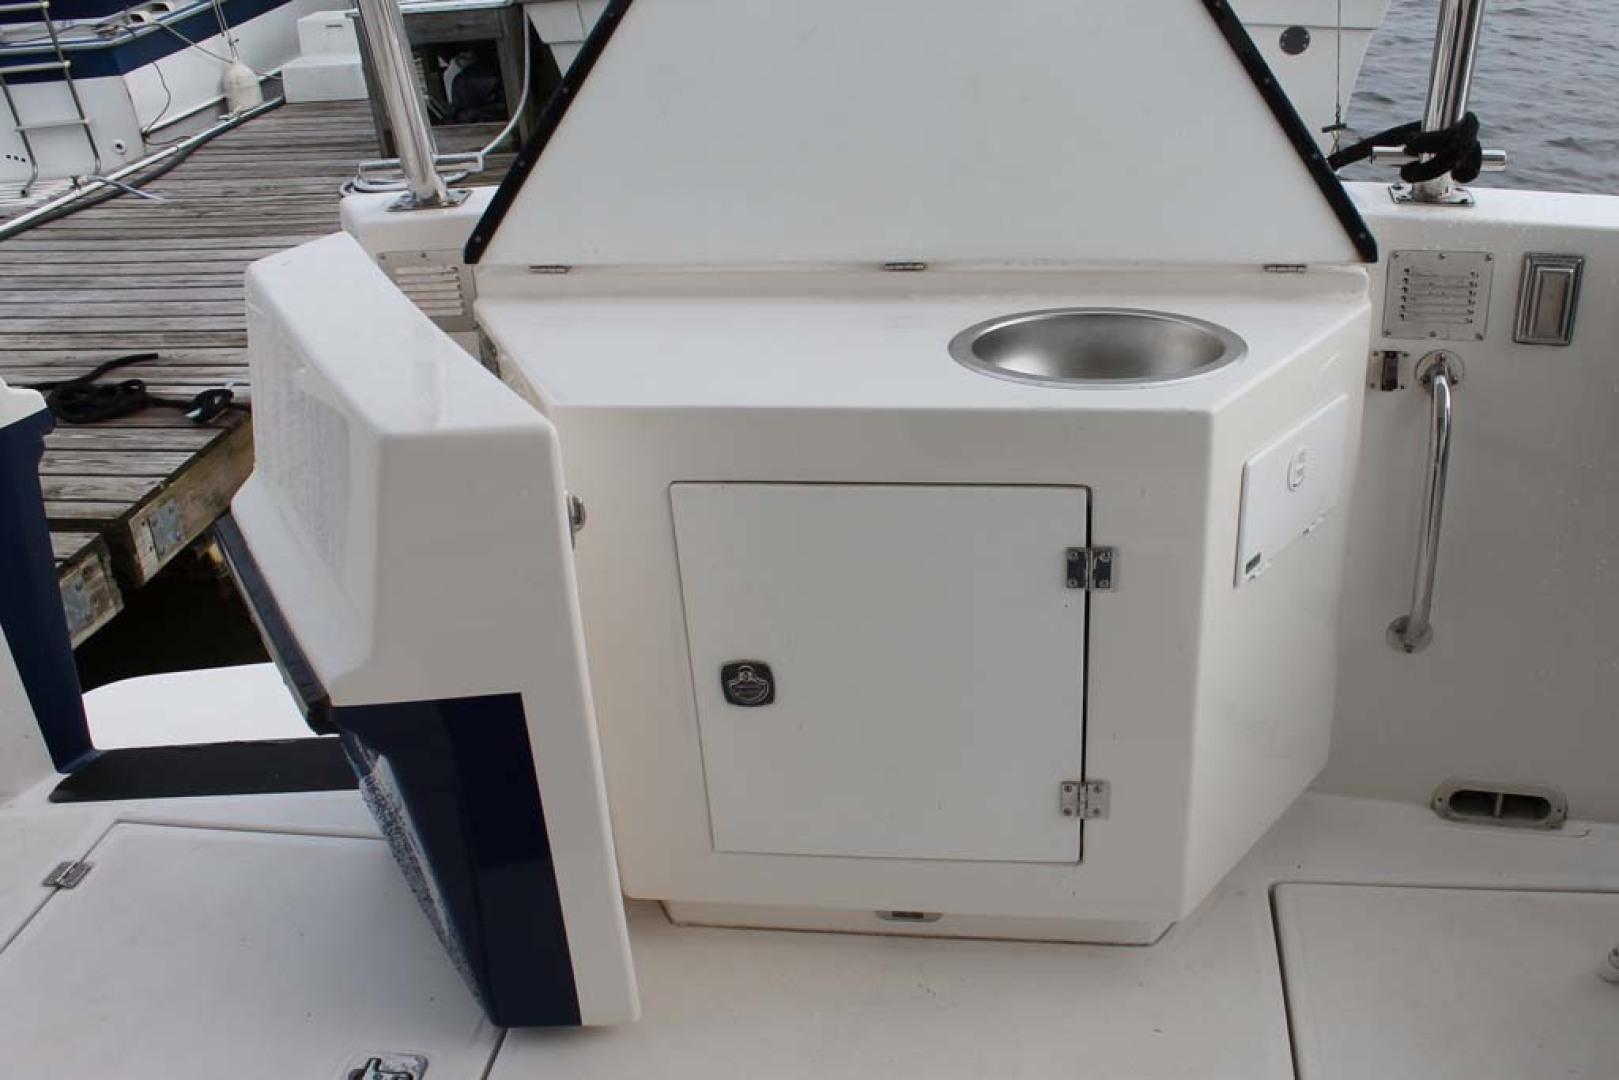 American Tug-Pilothouse 2006-Peregrine Albany-New York-United States-Cockpit Sink-1063138 | Thumbnail